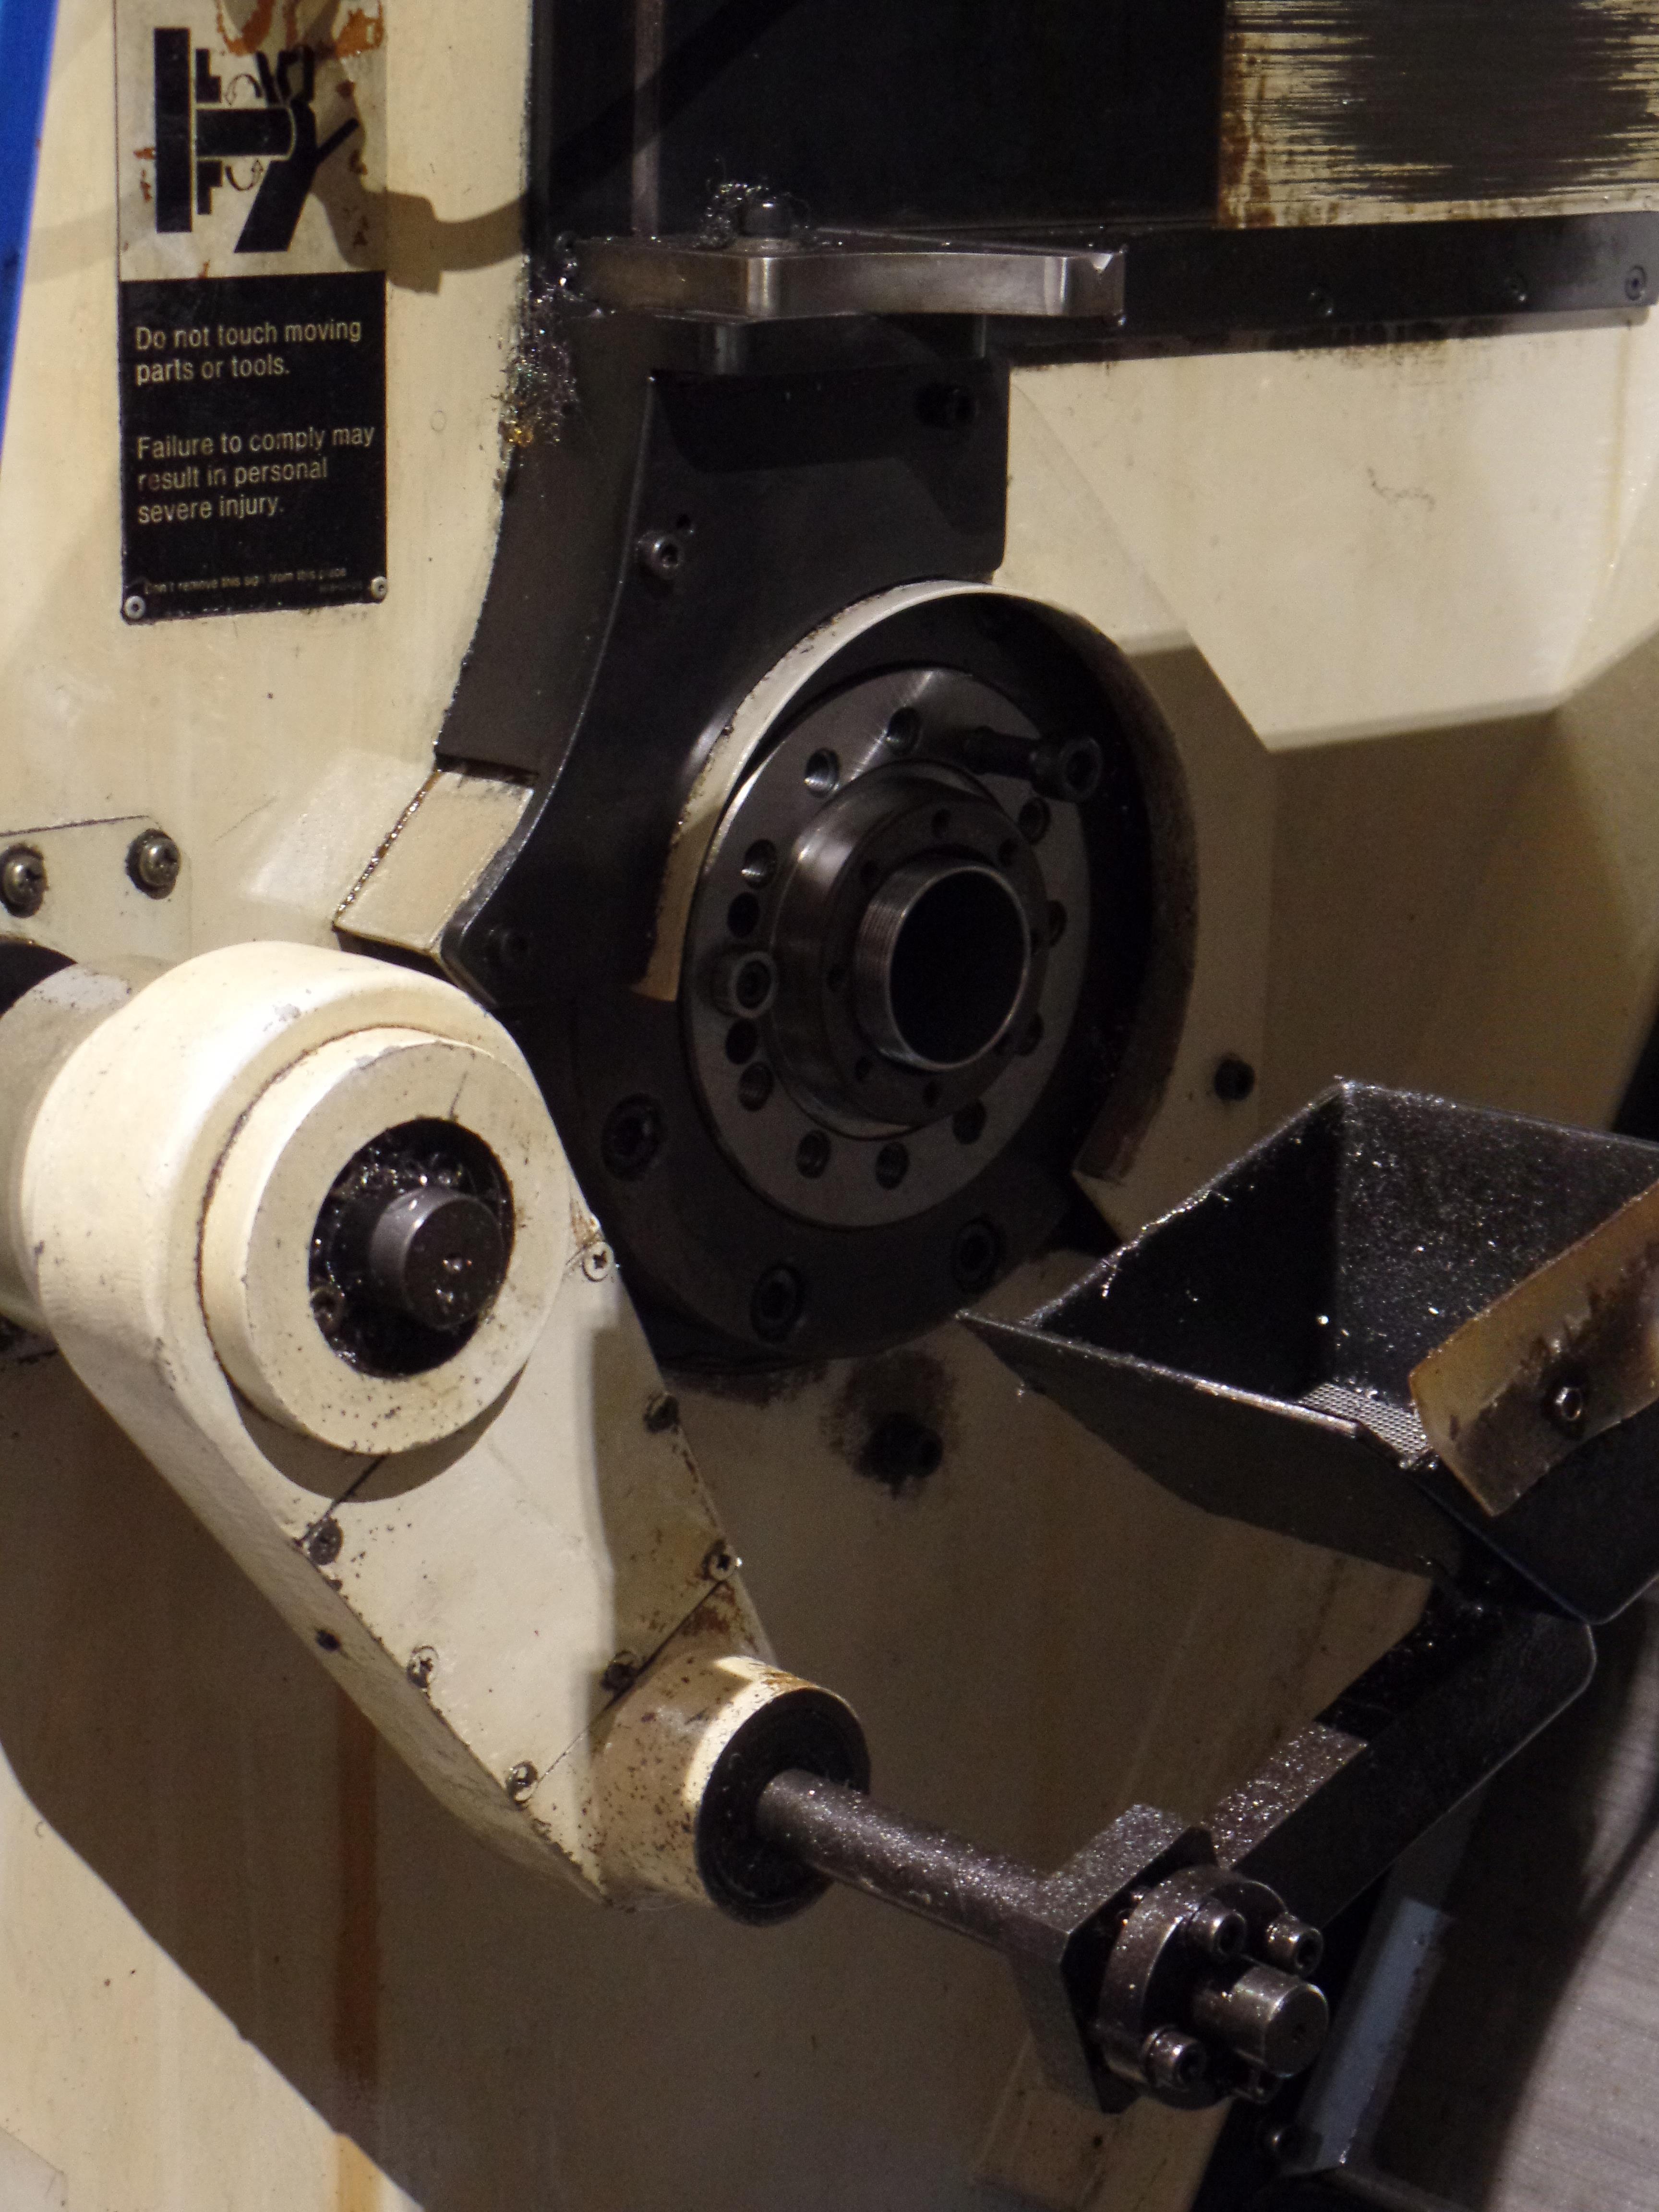 Kia 450 CNC Turning Center Oi-T Control, New 2003 - Image 4 of 7